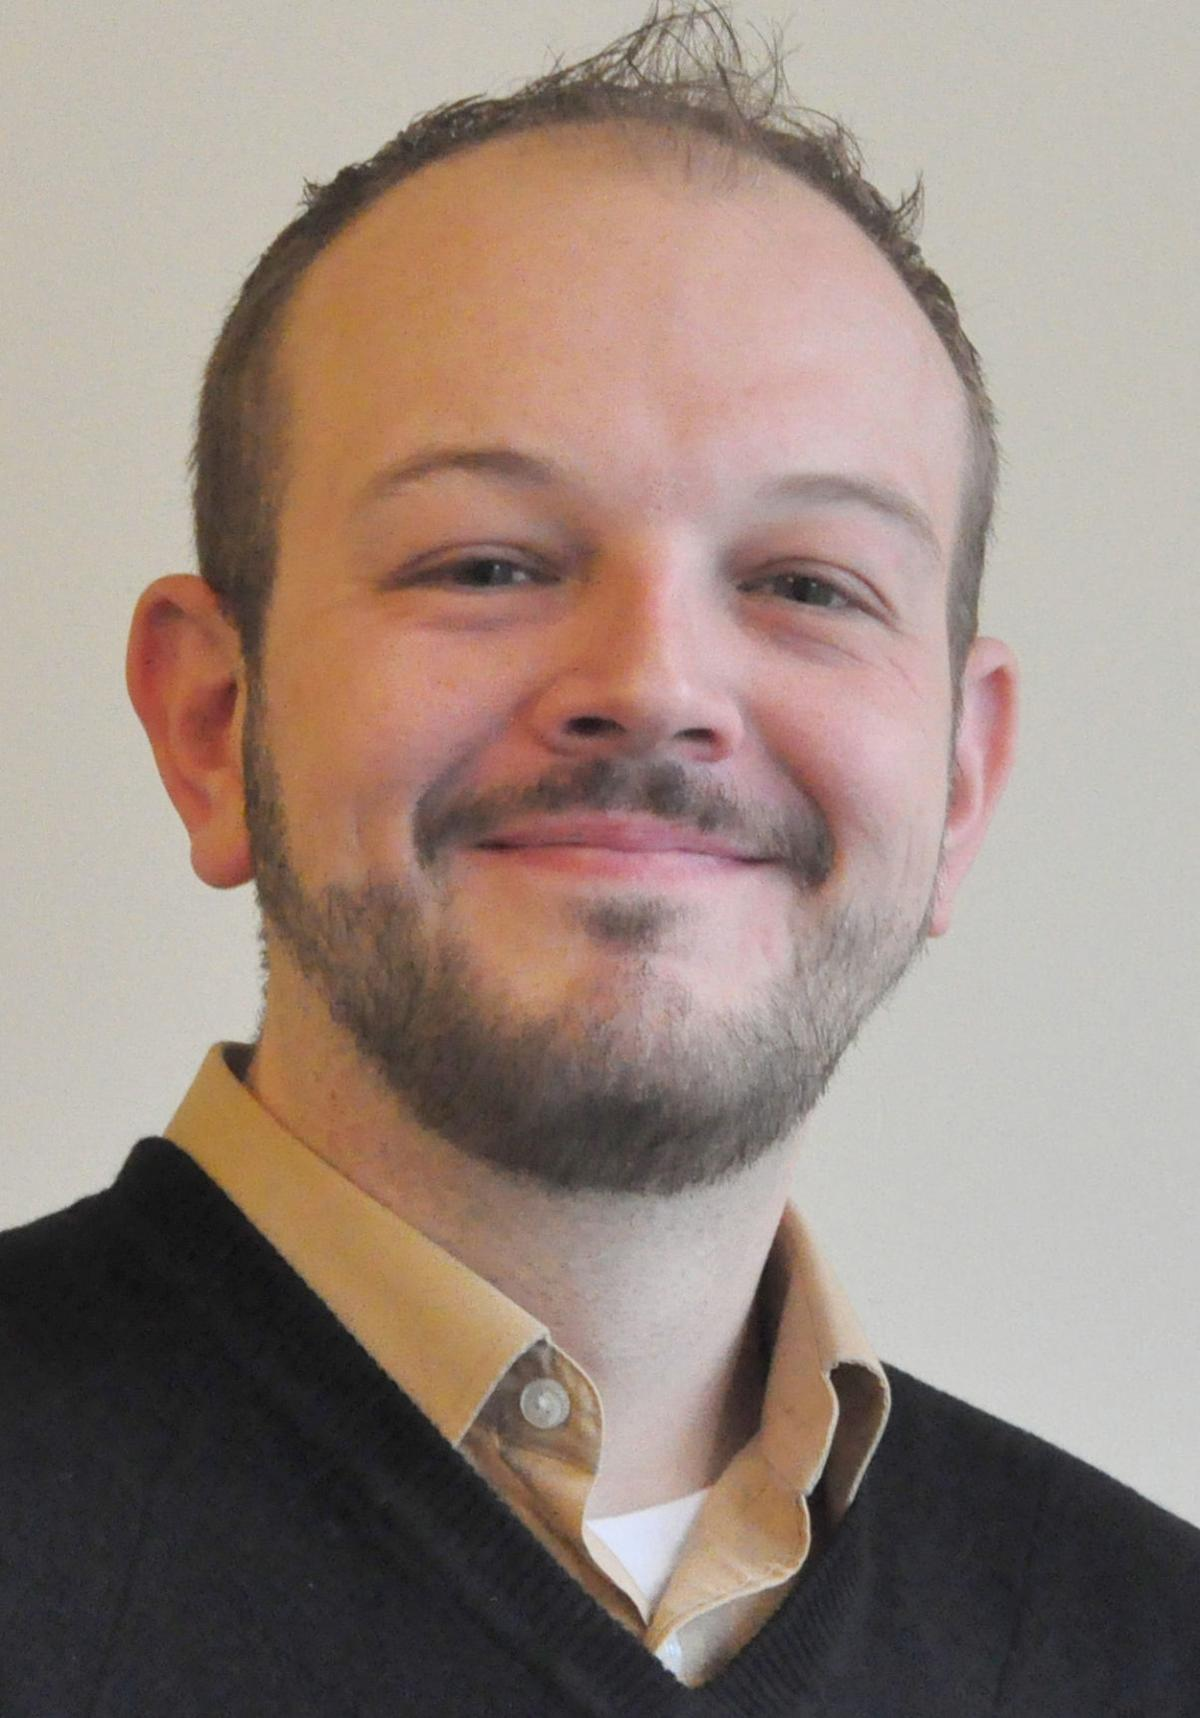 Jeff Brand